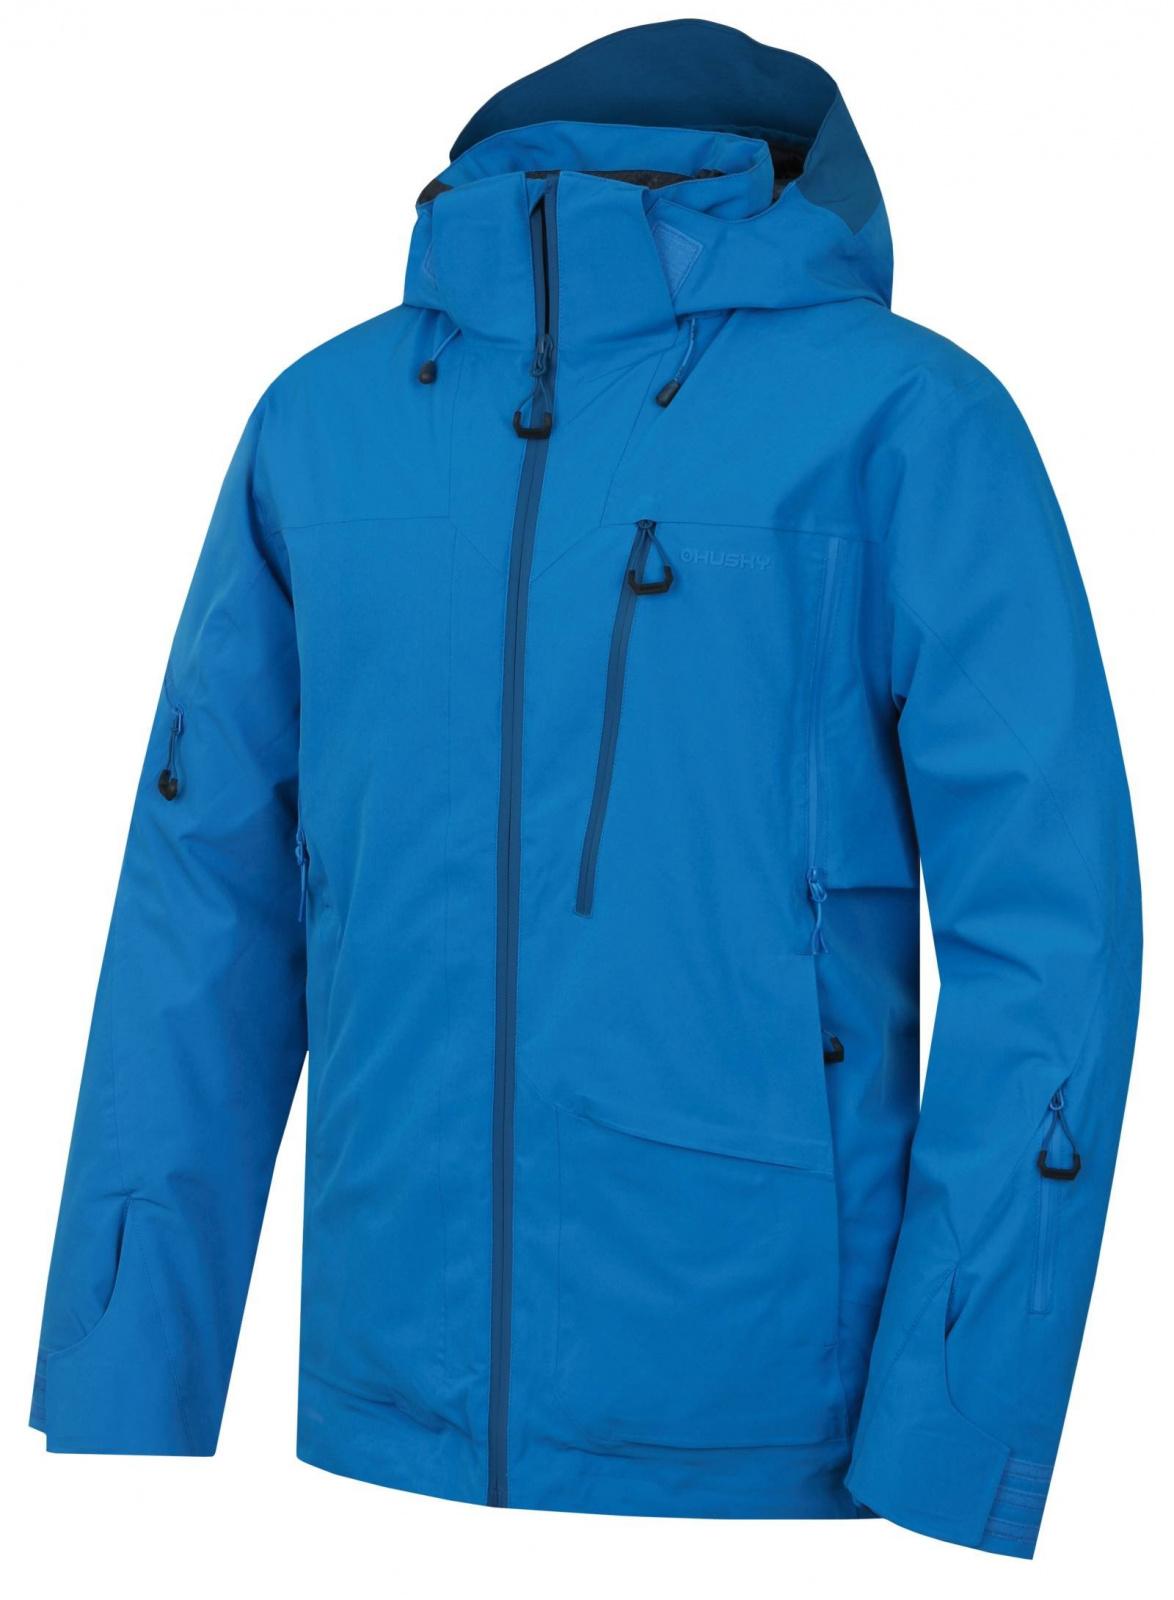 Husky Montry M modrá, M Pánska lyžiarska bunda